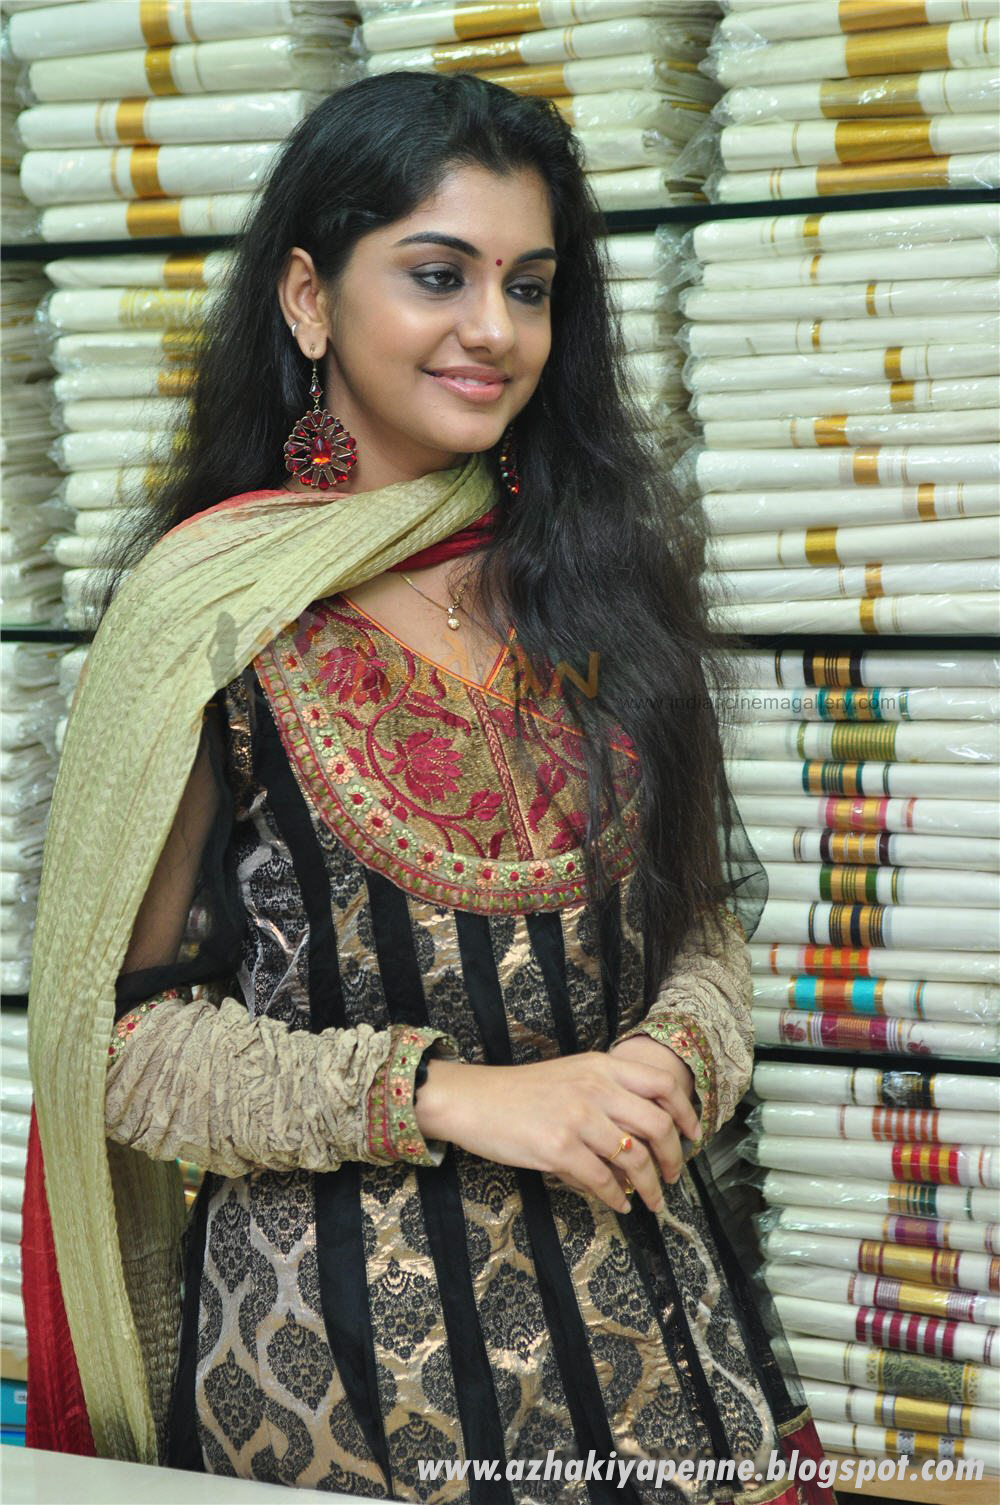 Surya singer sandra photos List of stage names - Wikipedia